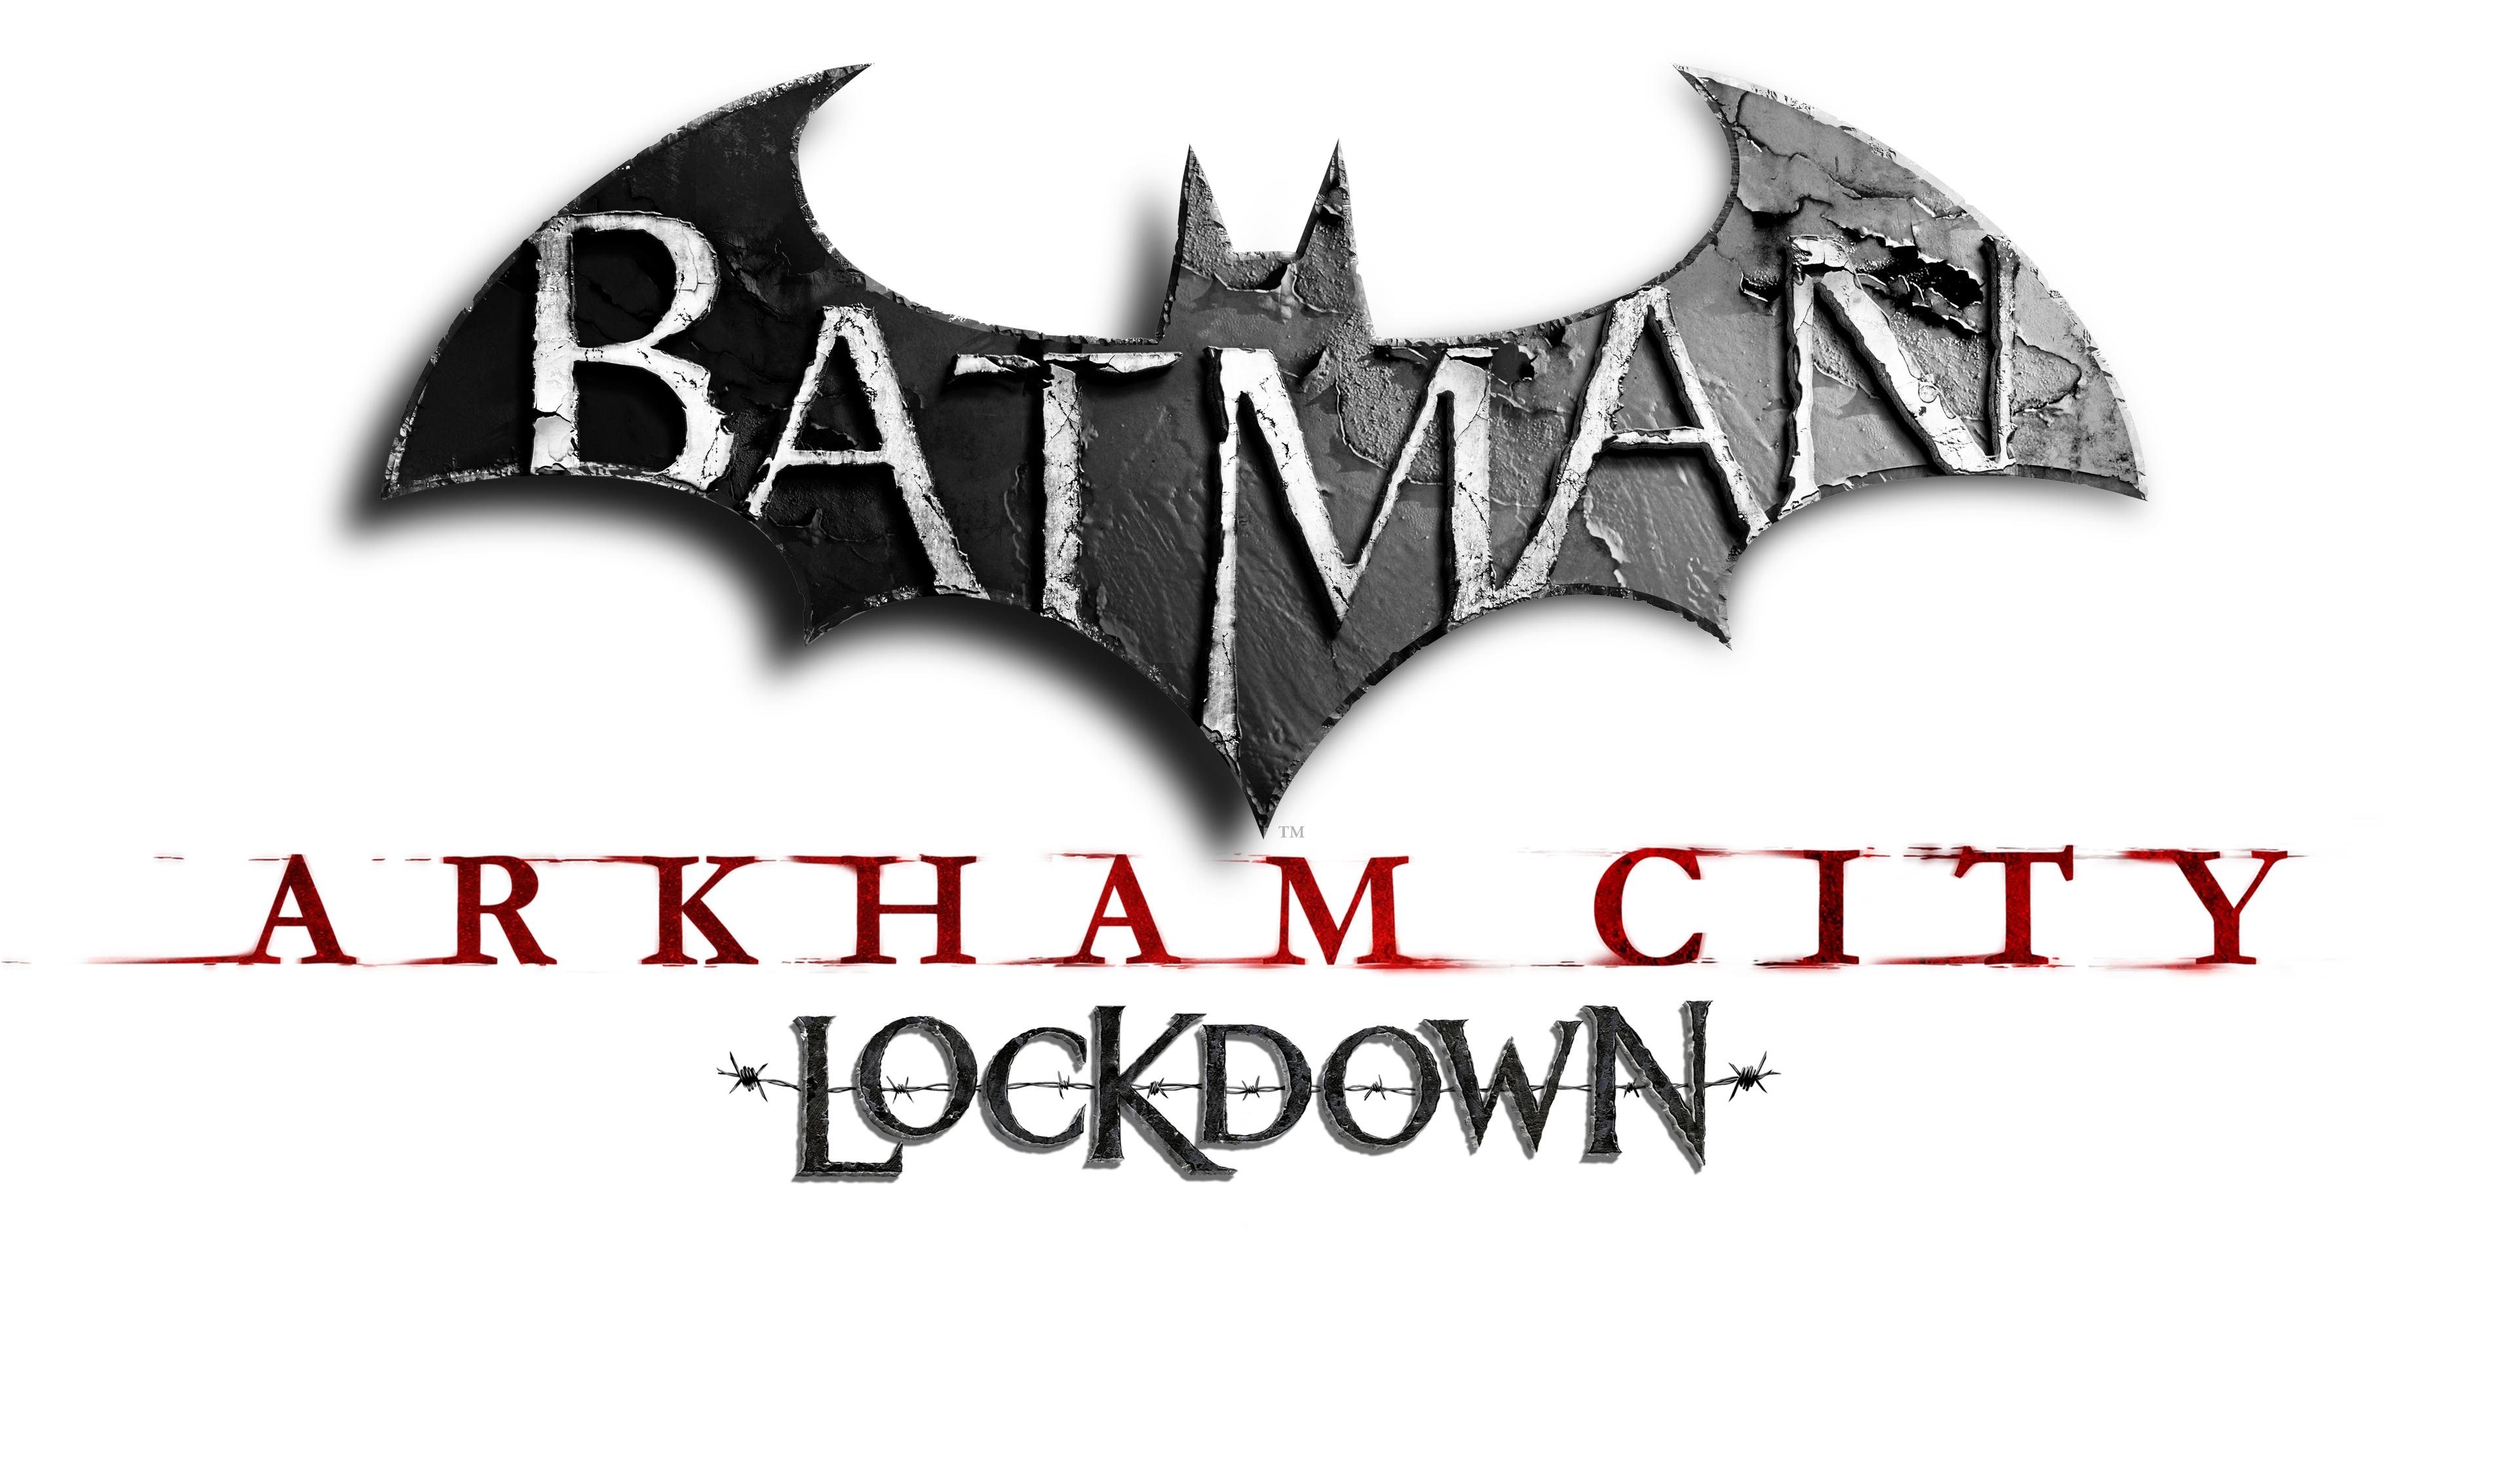 Batman Arkham City Lockdown Logo Ultimatecompromise Psd Jpgcopy